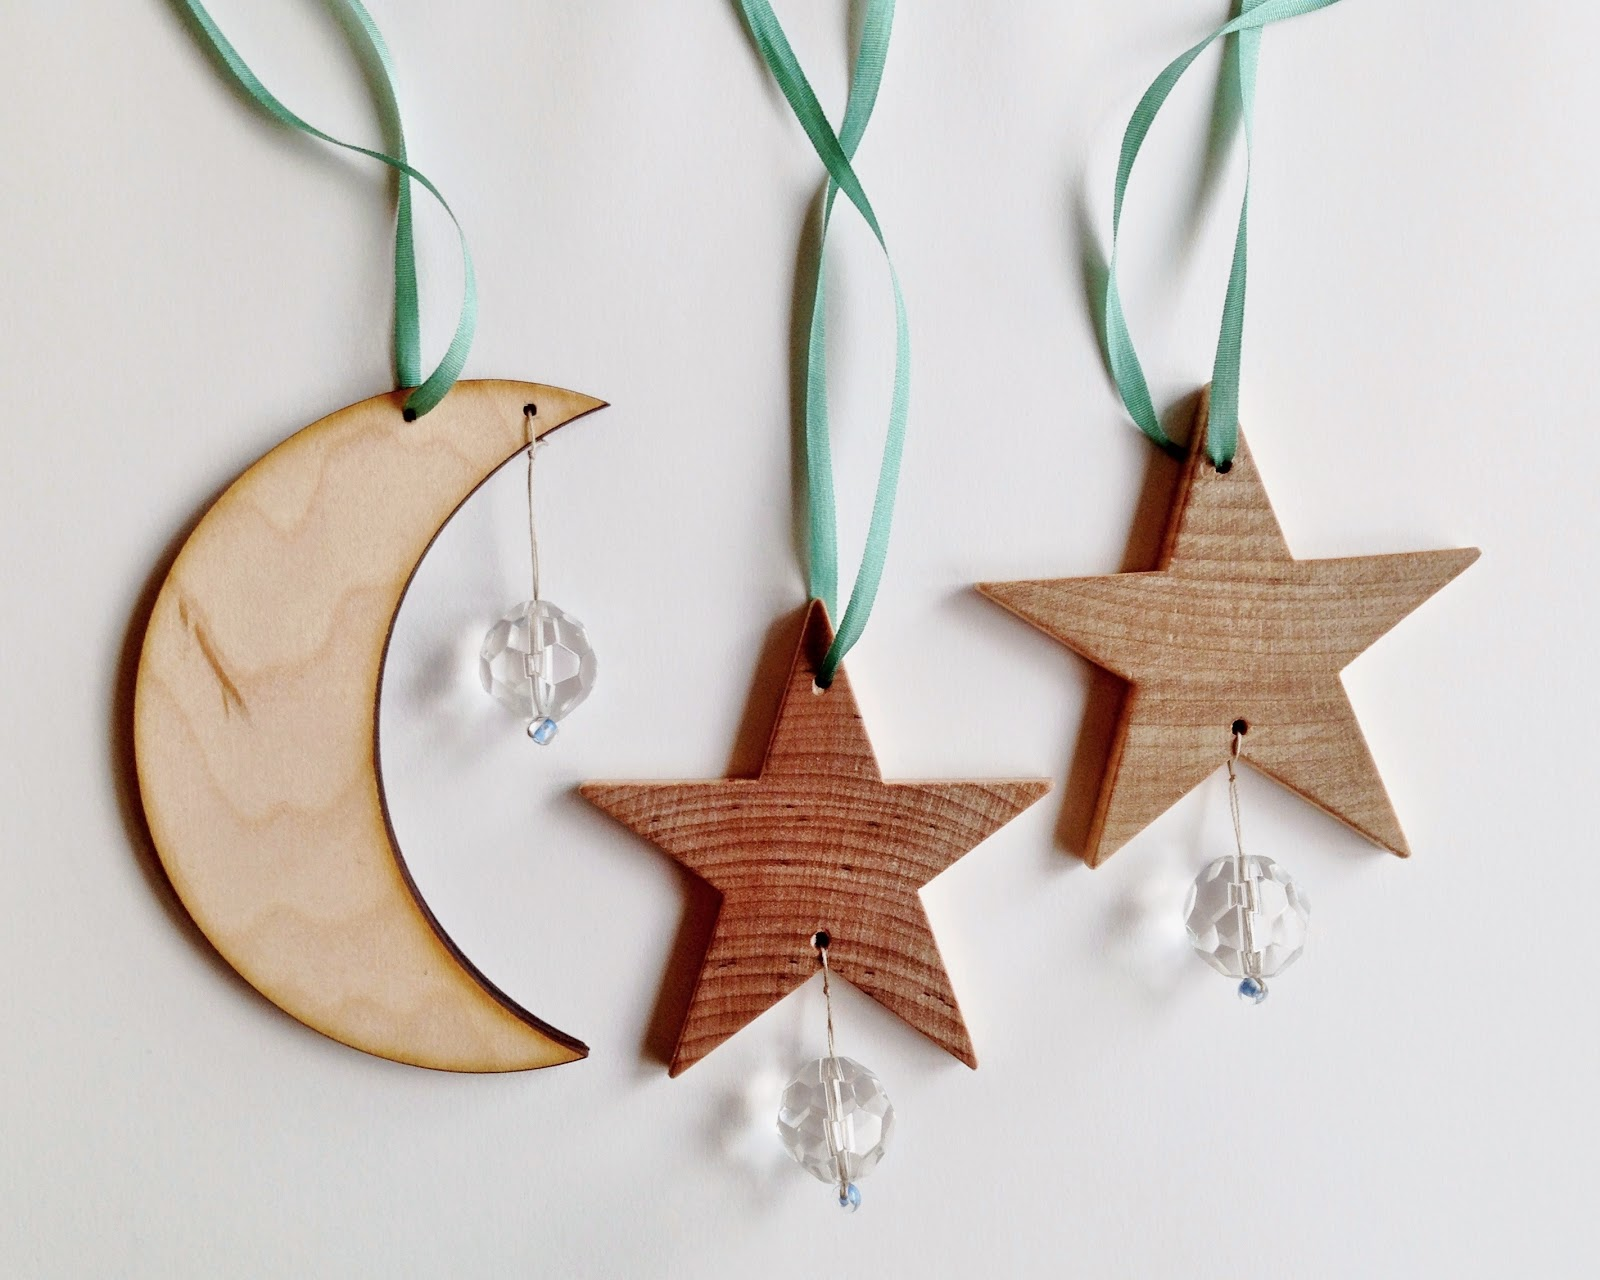 http://webloomhere.blogspot.com/2014/12/solstice-sun-catcher-tutorial.html